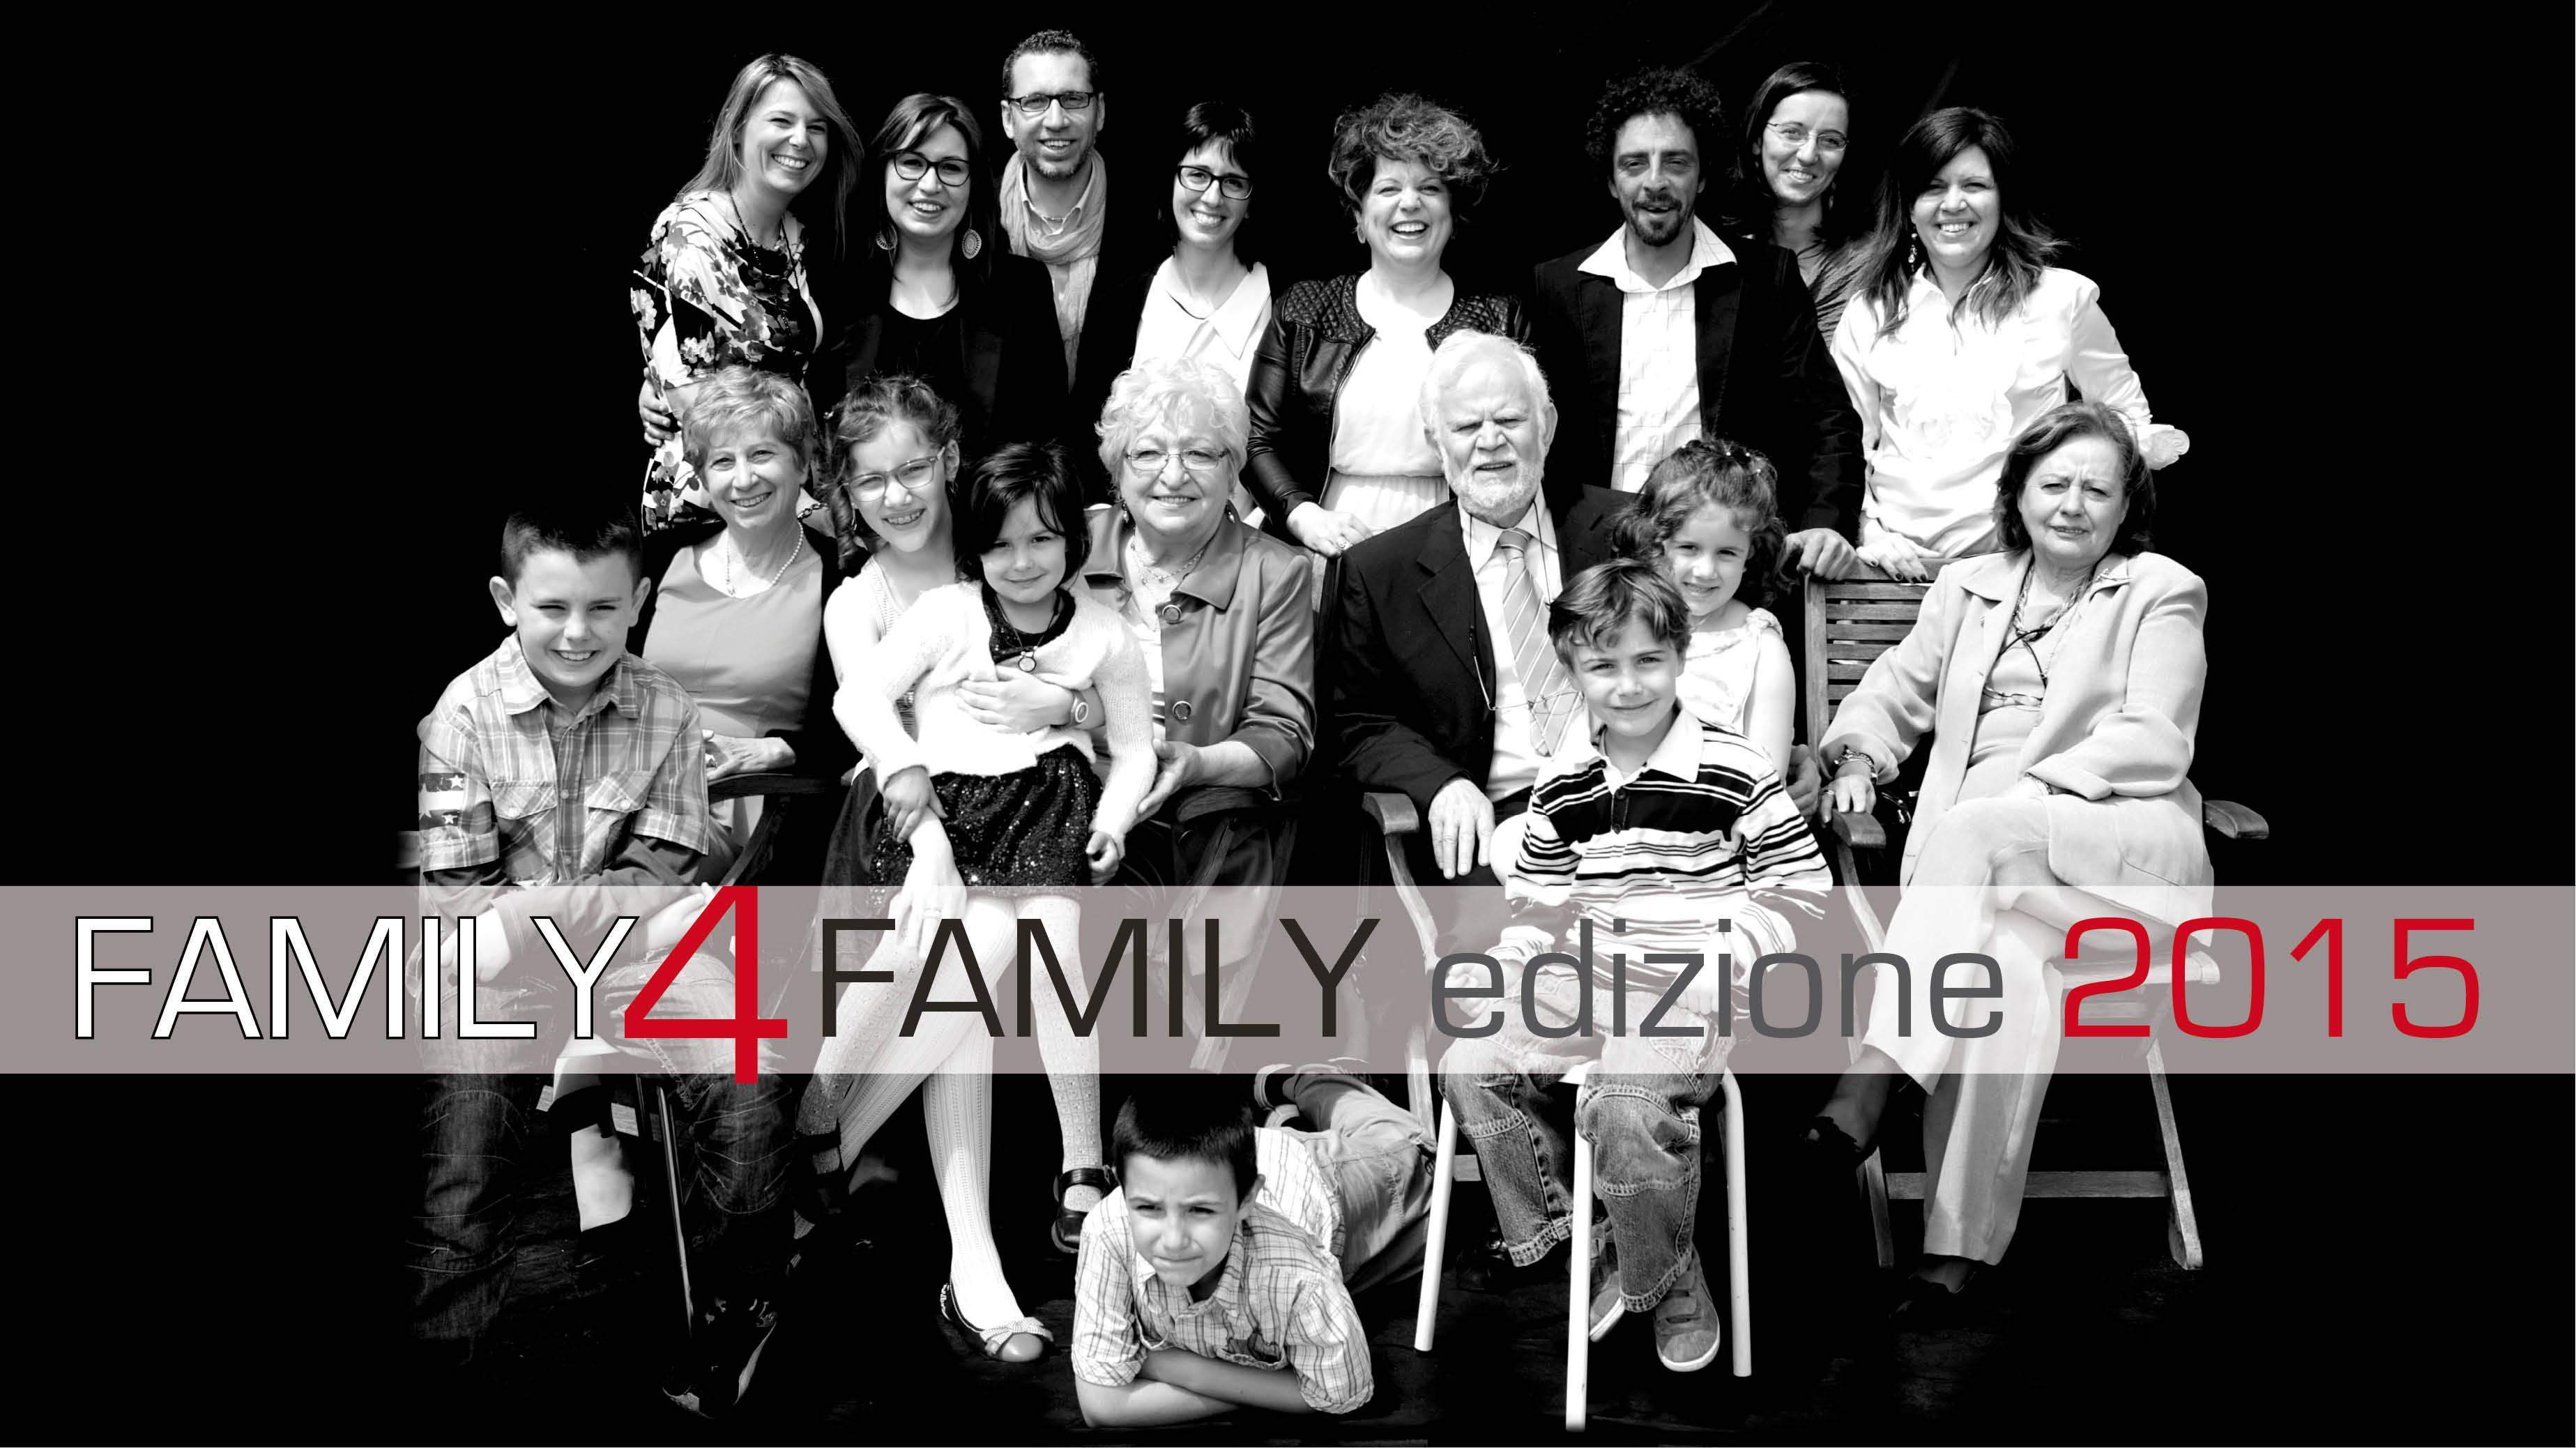 La Guida - Family4Family immortala 140 famiglie cuneesi